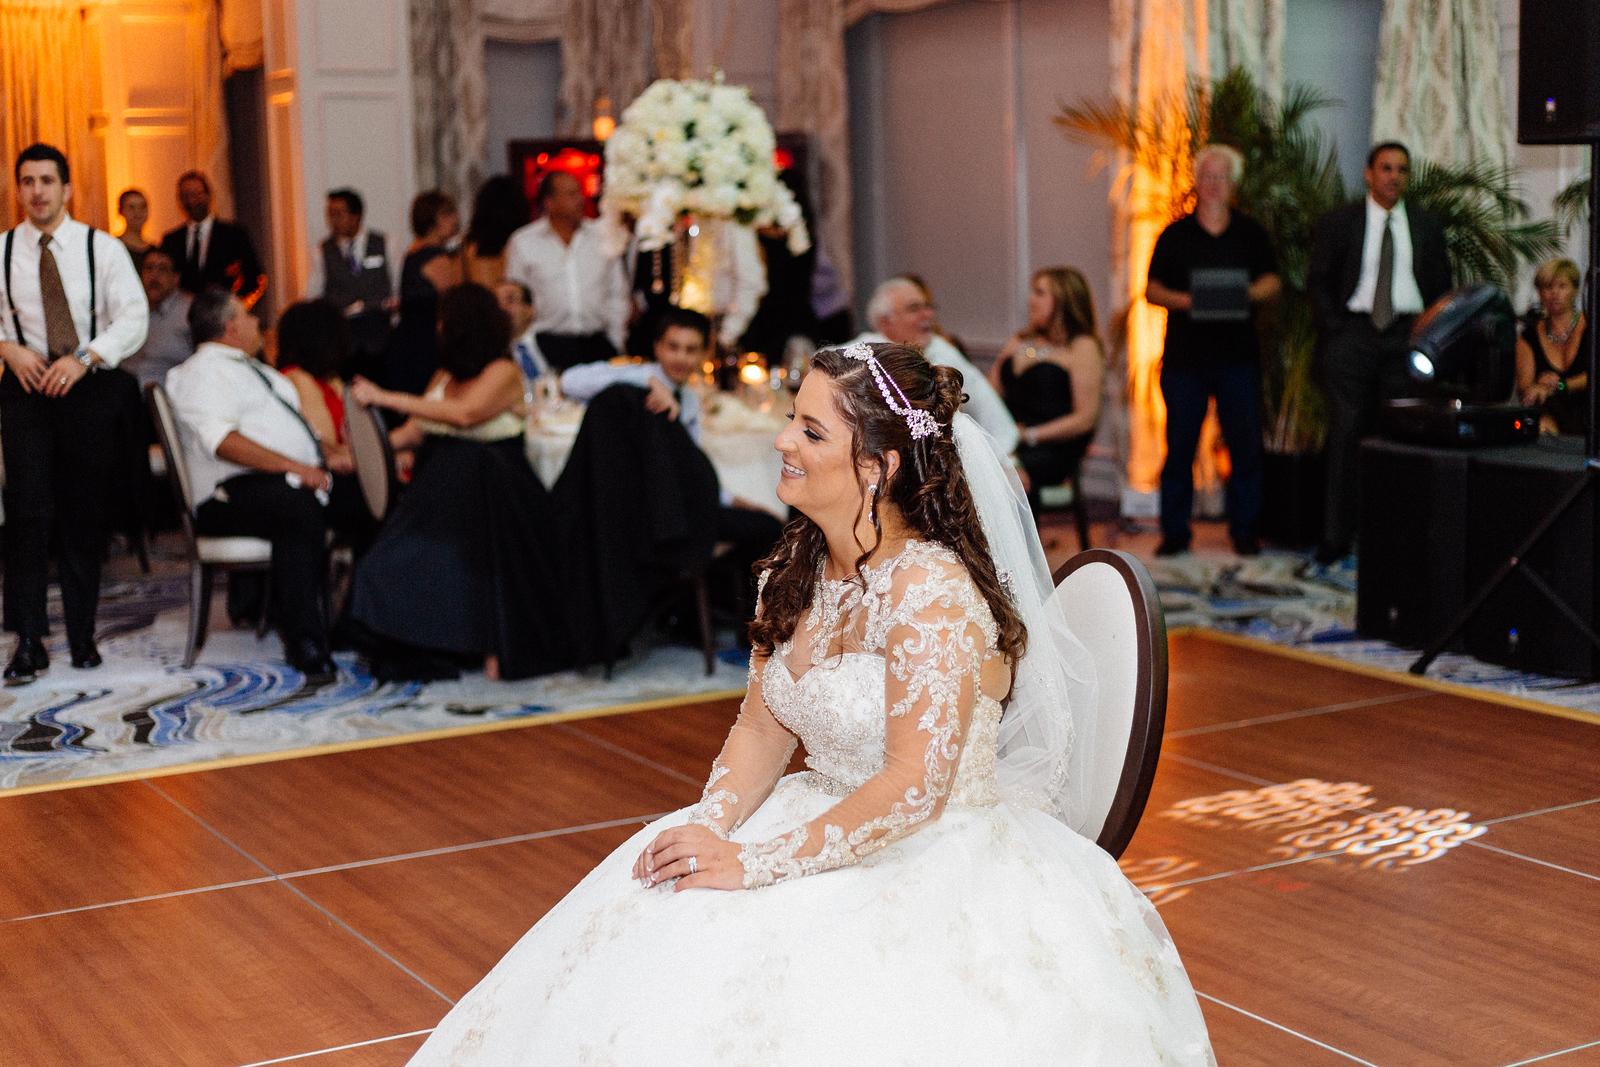 South-Florida-Wedding-Photographer-Andreo-5D3_5424